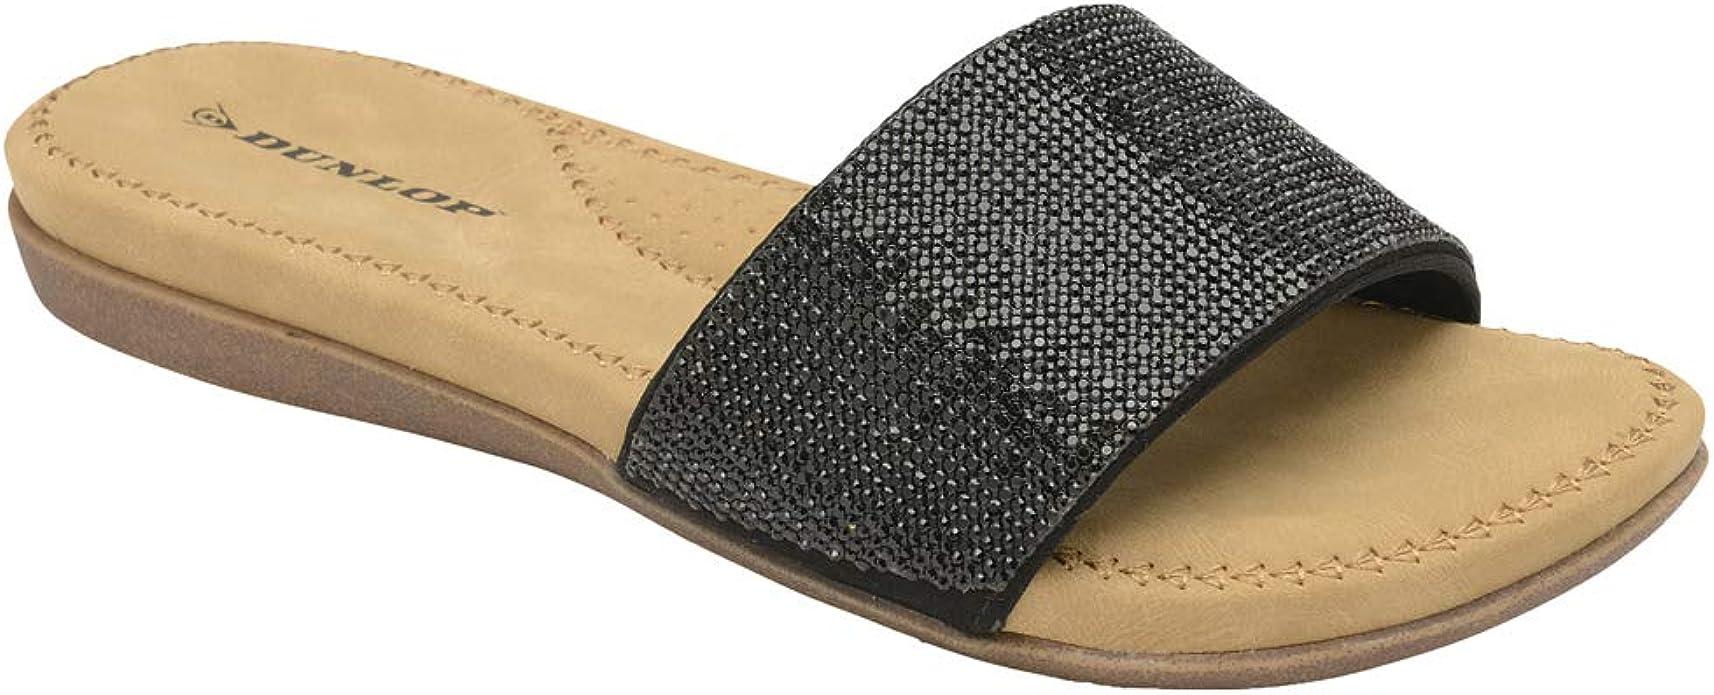 Dunlop Flip Flops Toe Post Slip on